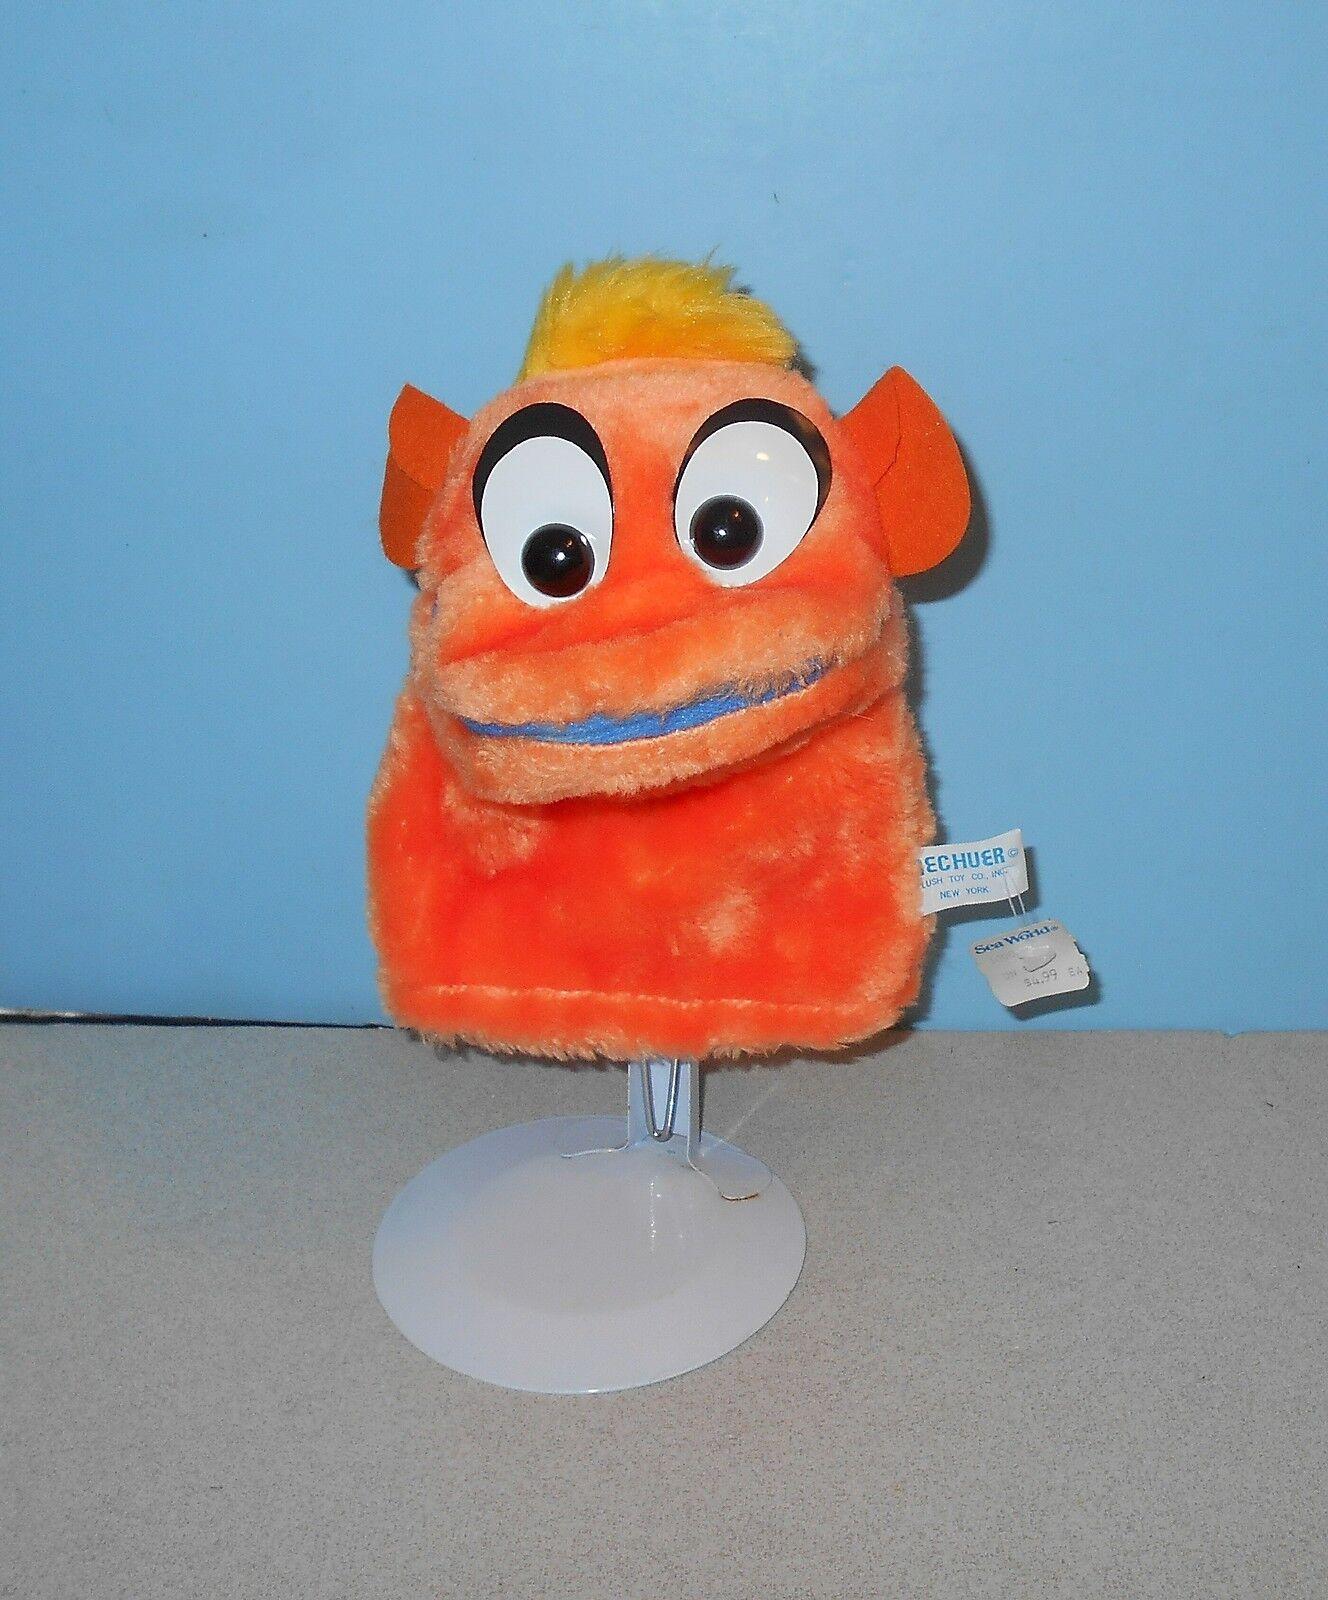 Vintage Brechuer Toys Orange Creature 8